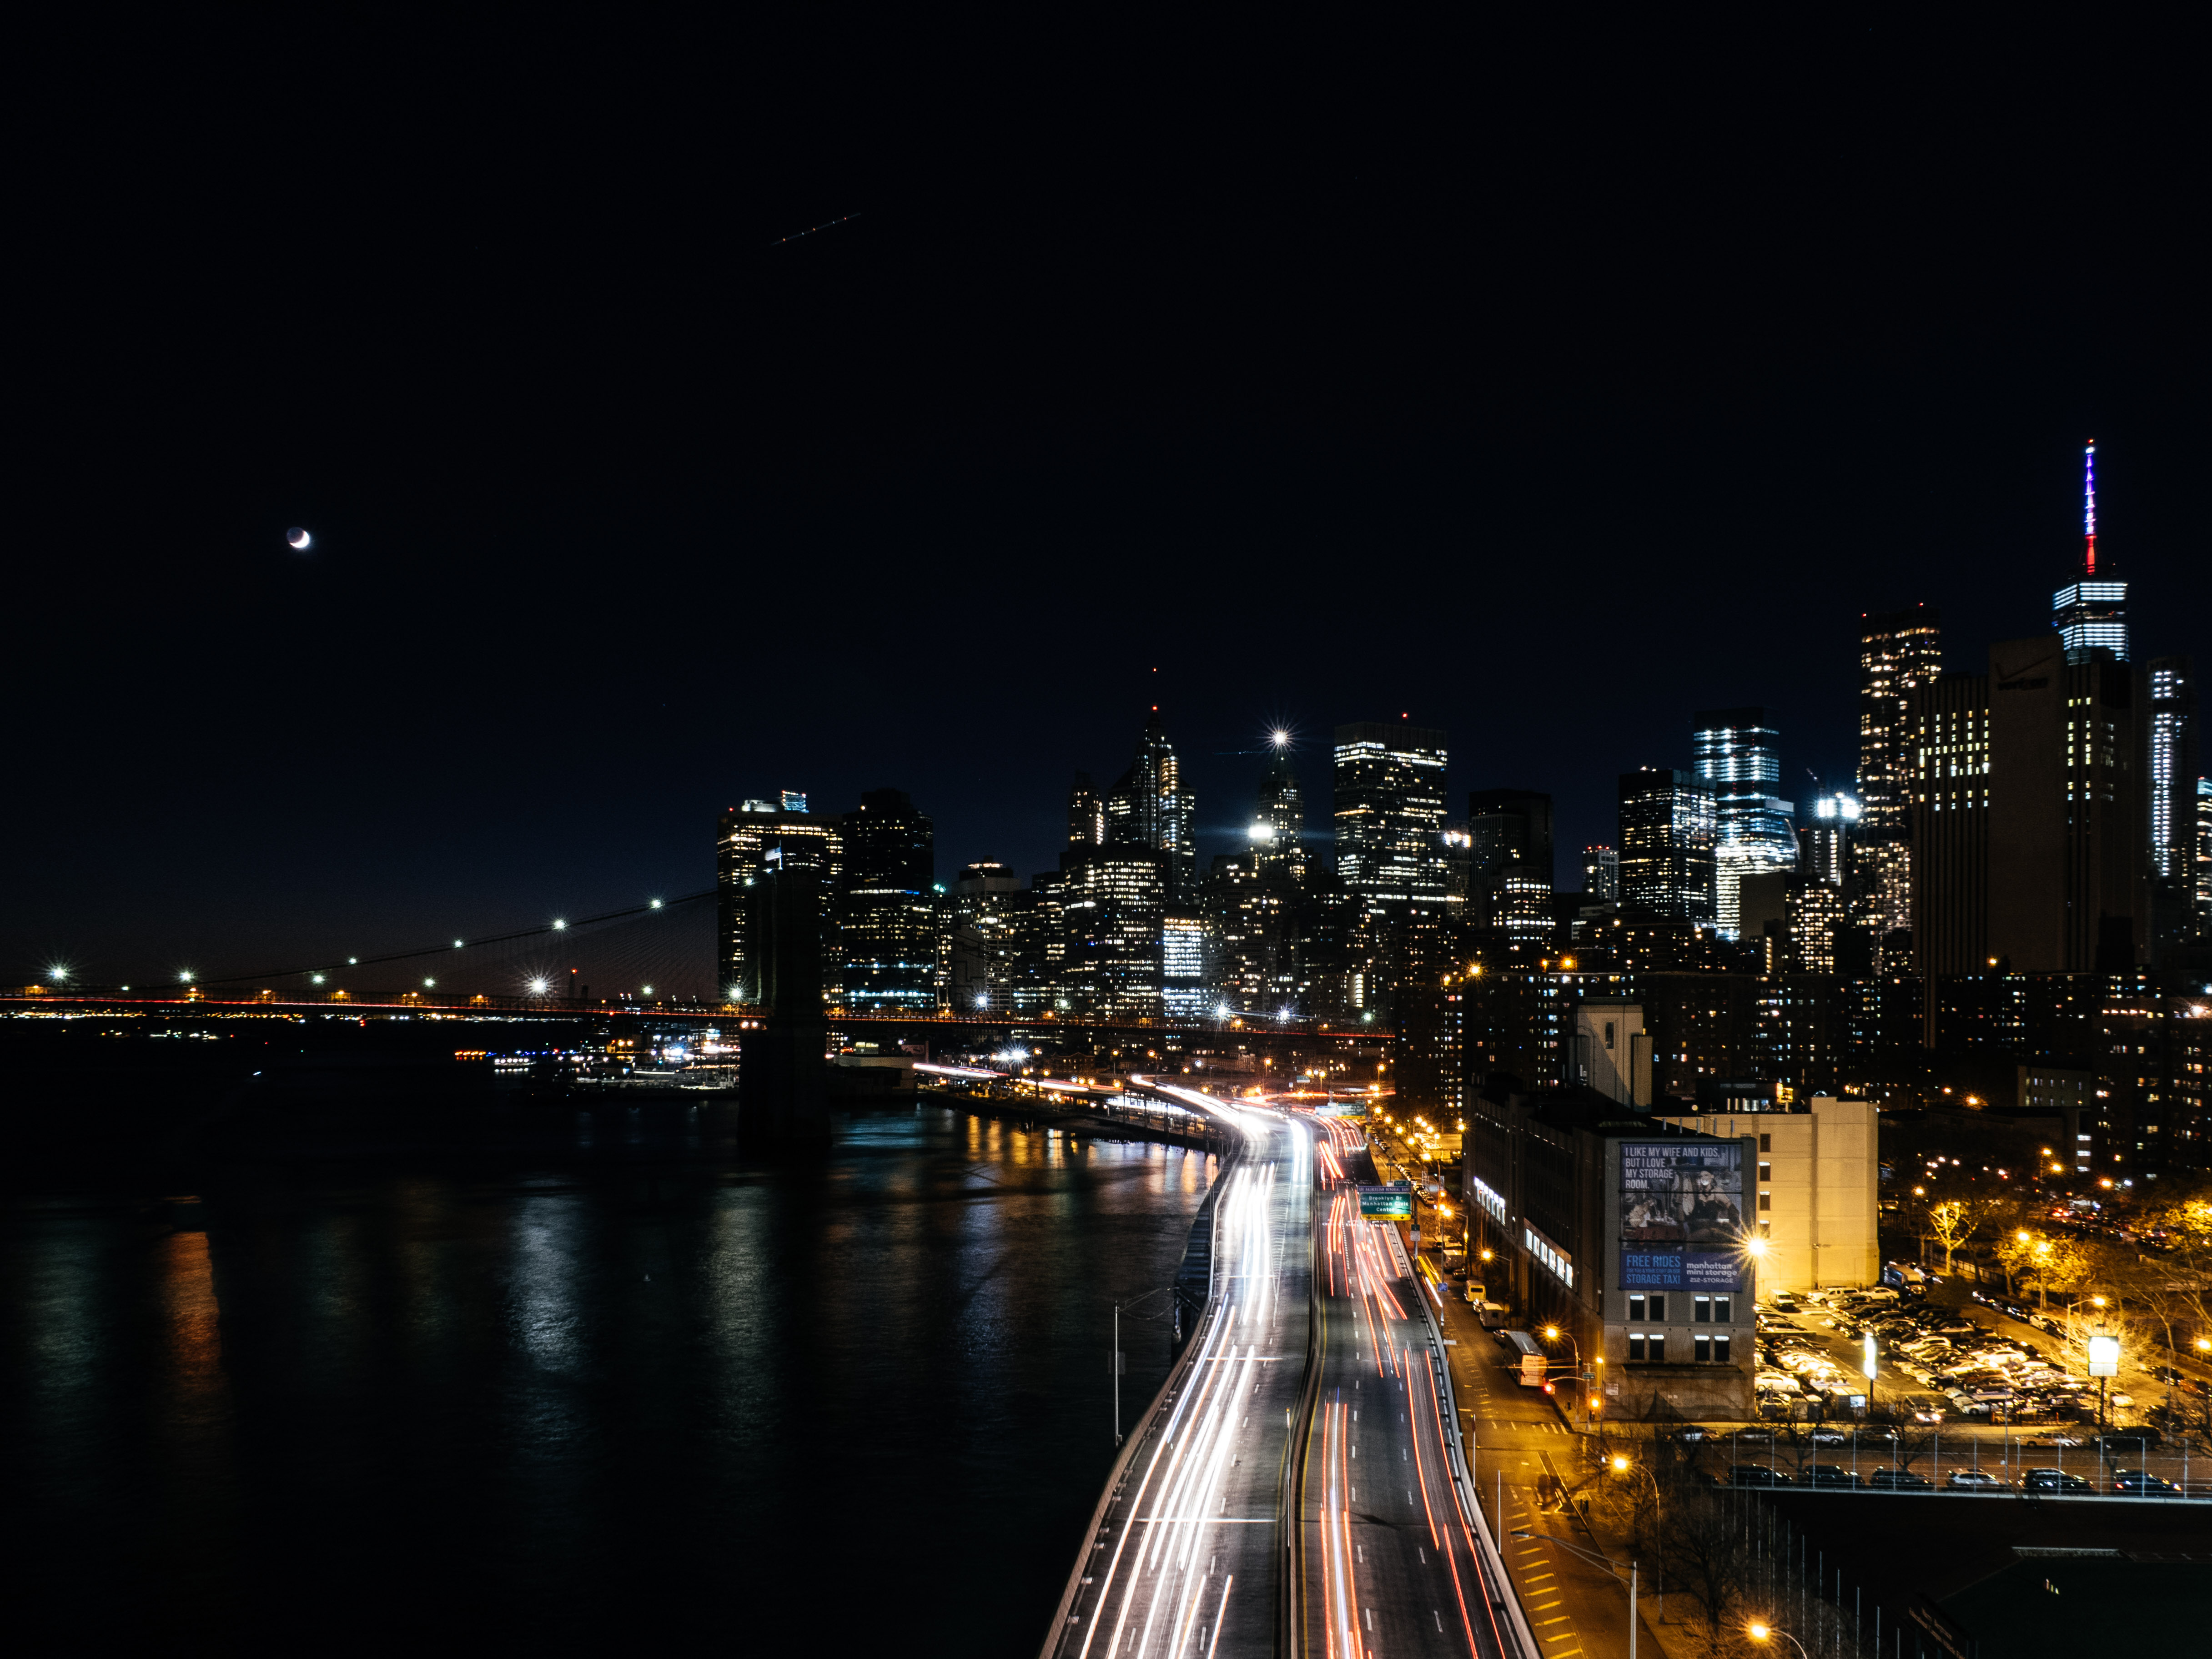 Night lights from the bridge